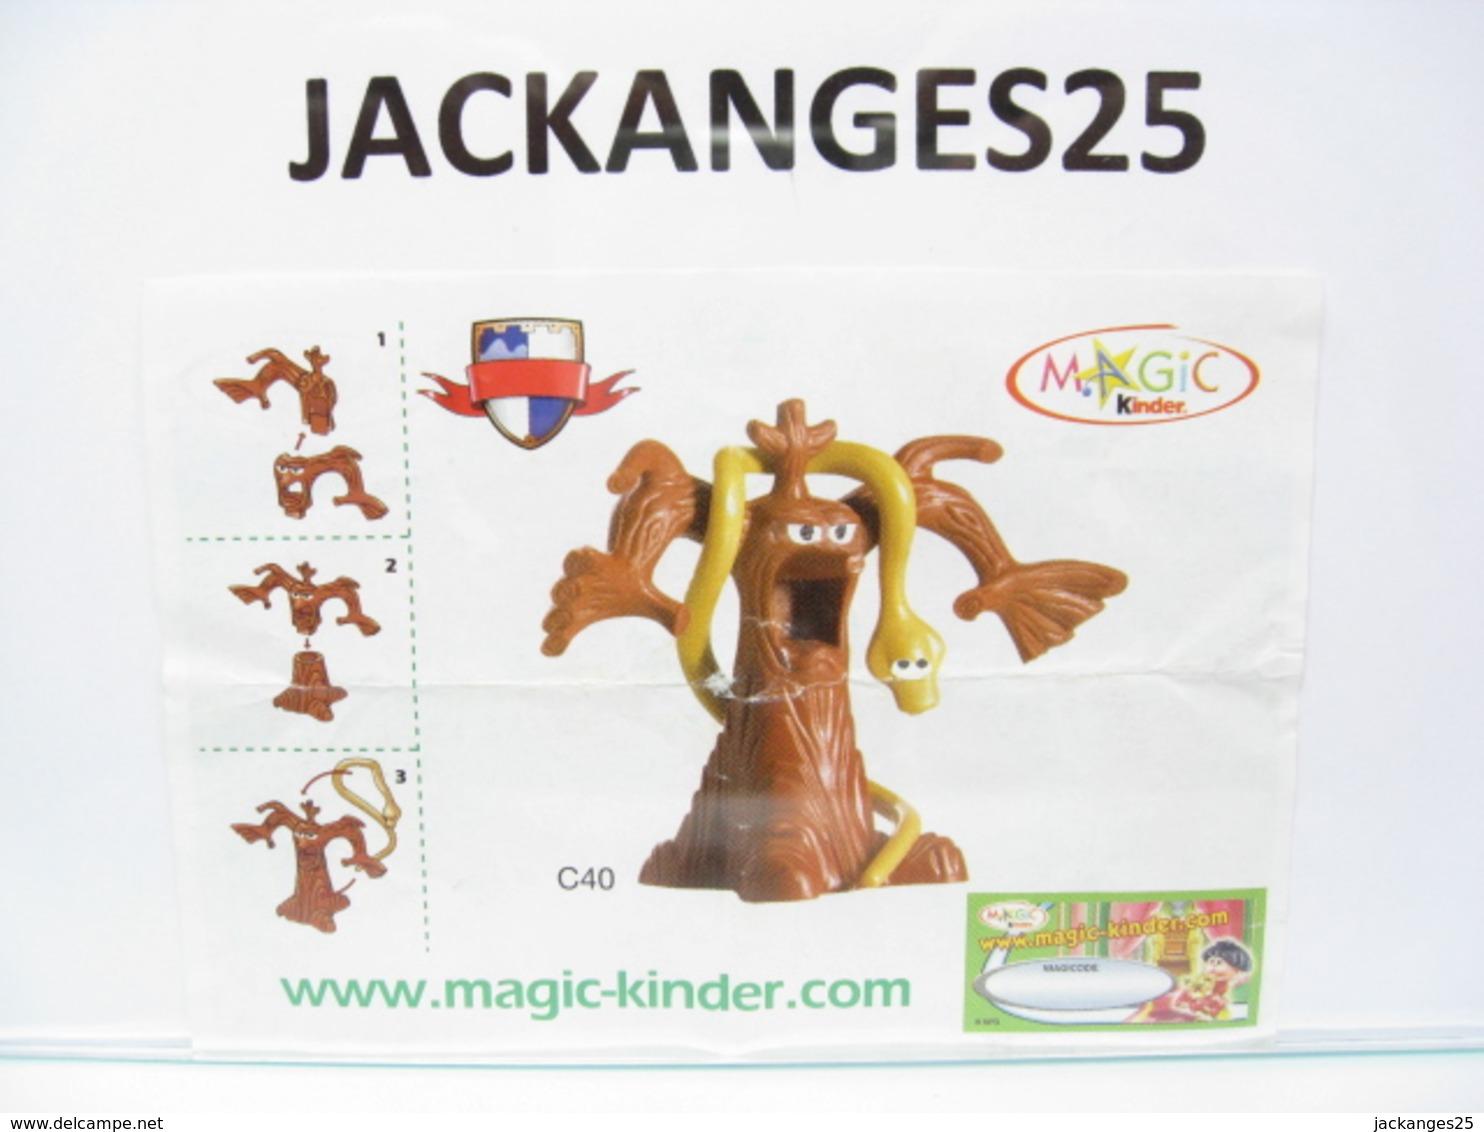 KINDER FUNNY CASTLE MPG C 40 2004 2005 + BPZ B EU 2004 + MAGIC CODE - Inzetting